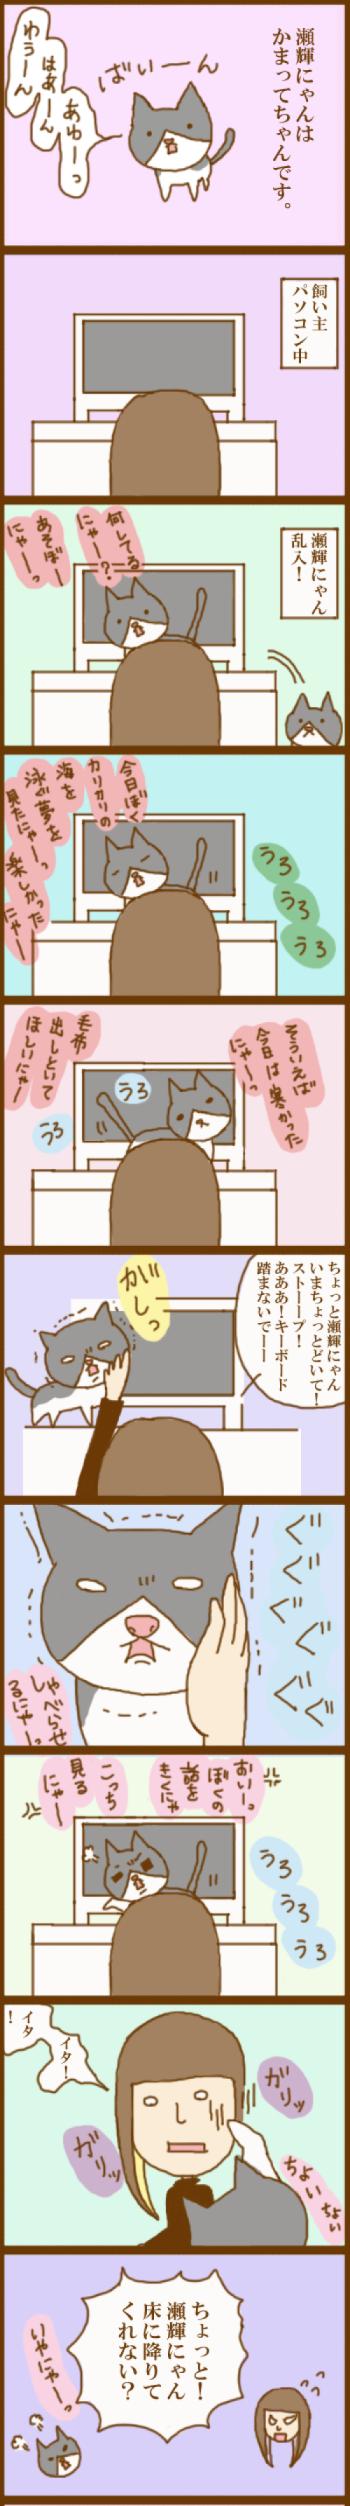 f:id:suzuokayu:20201115190536j:plain